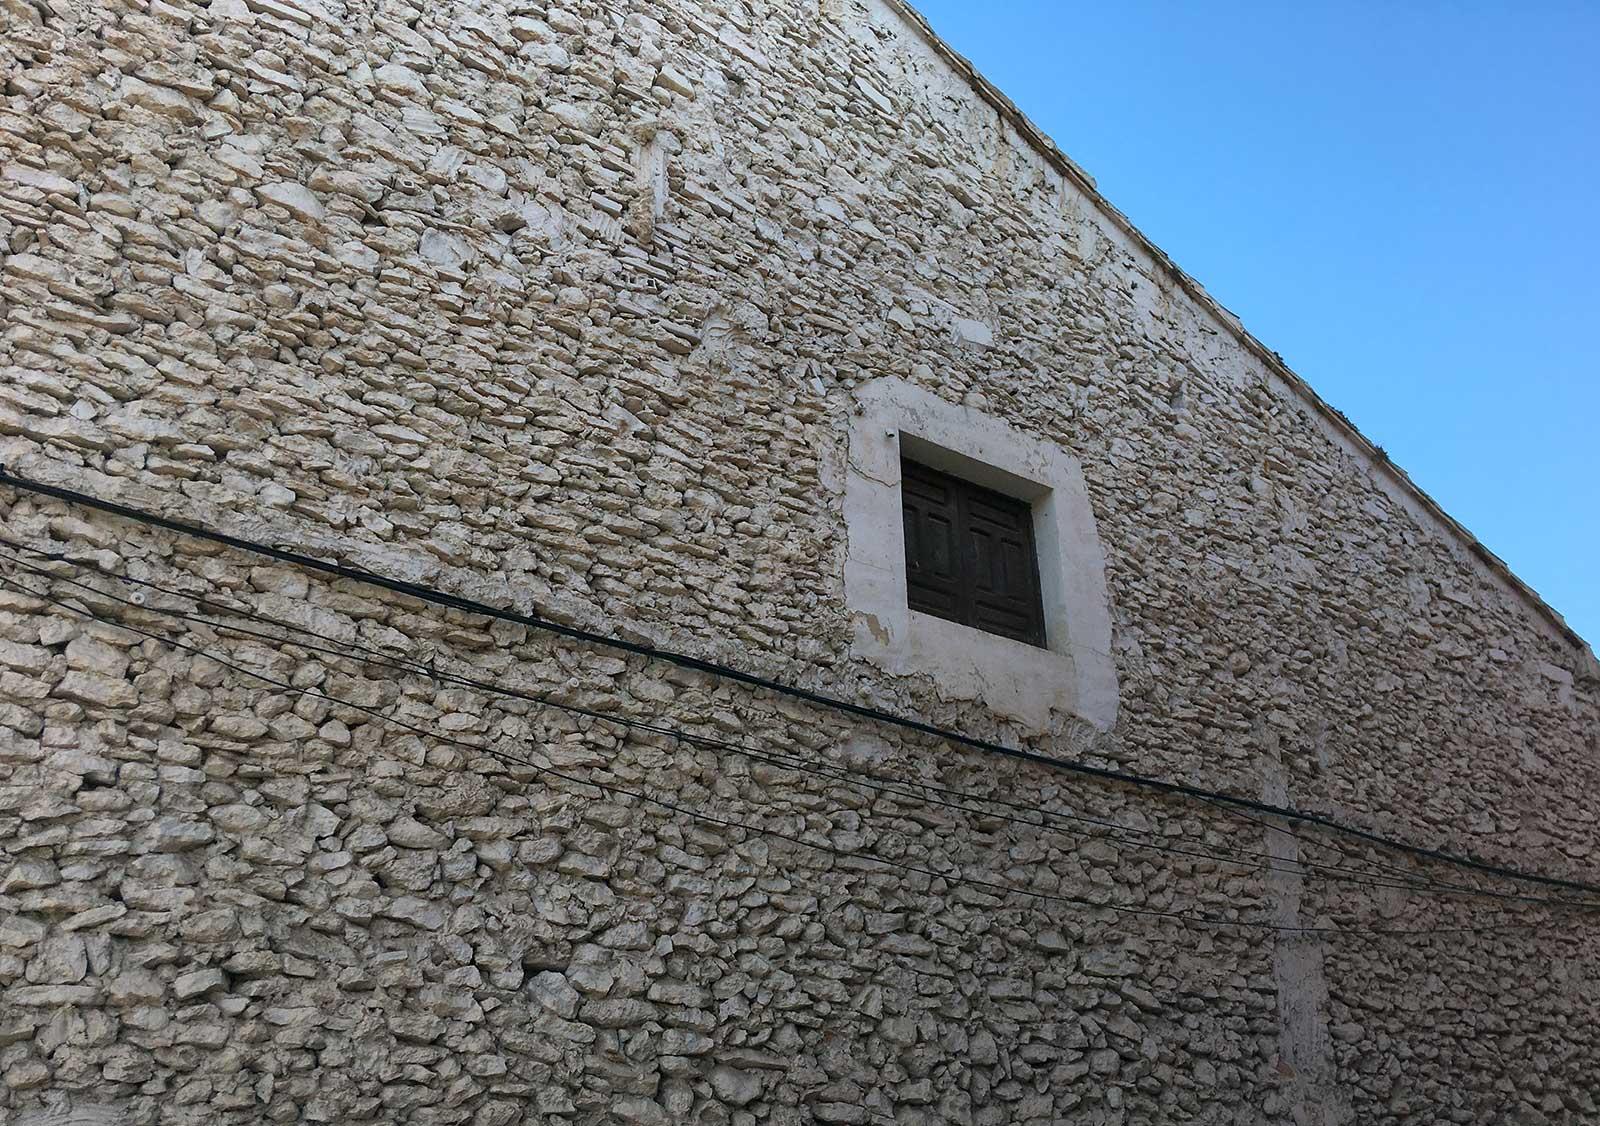 Antigua fachada lateral en la calle Numancia. Yecla, 2020